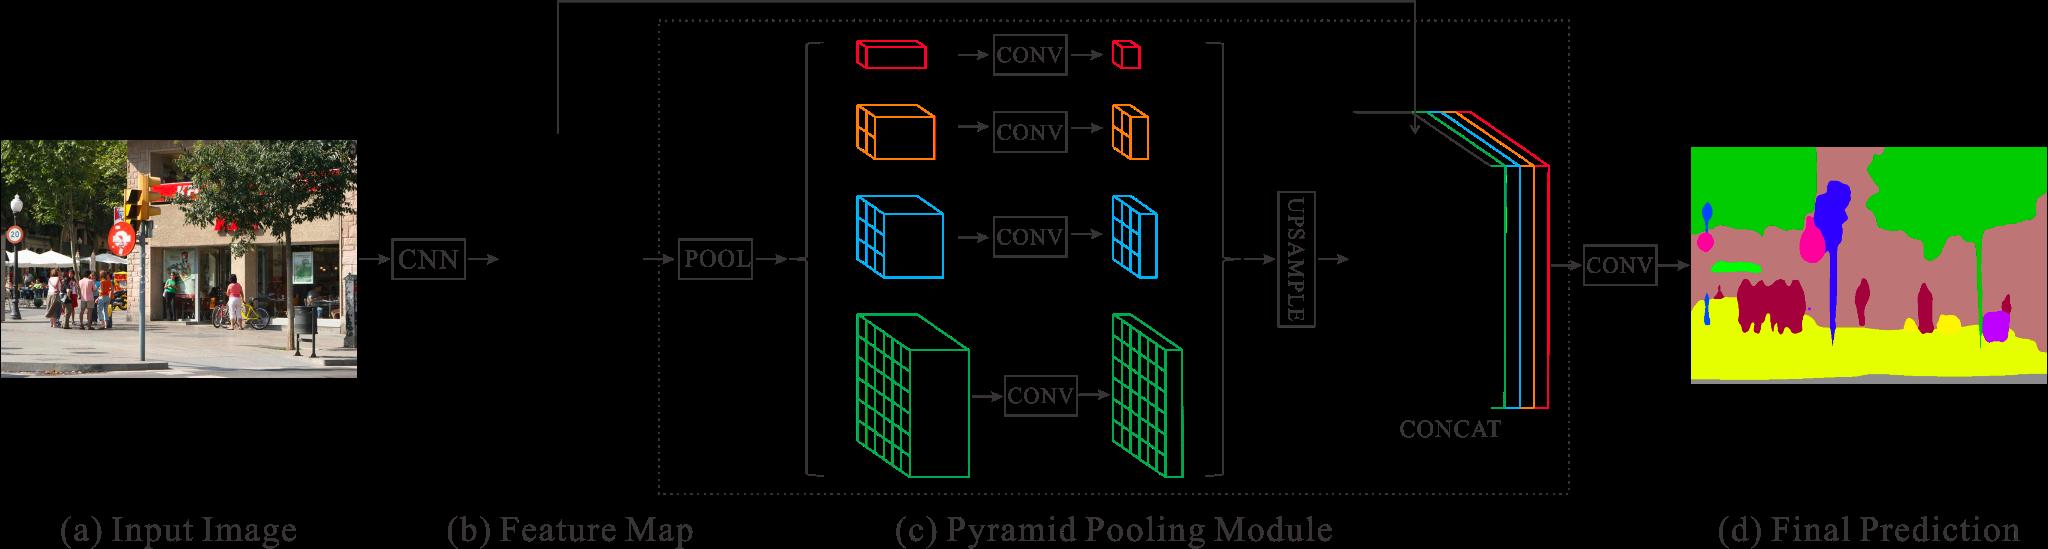 Pyramid pooling module